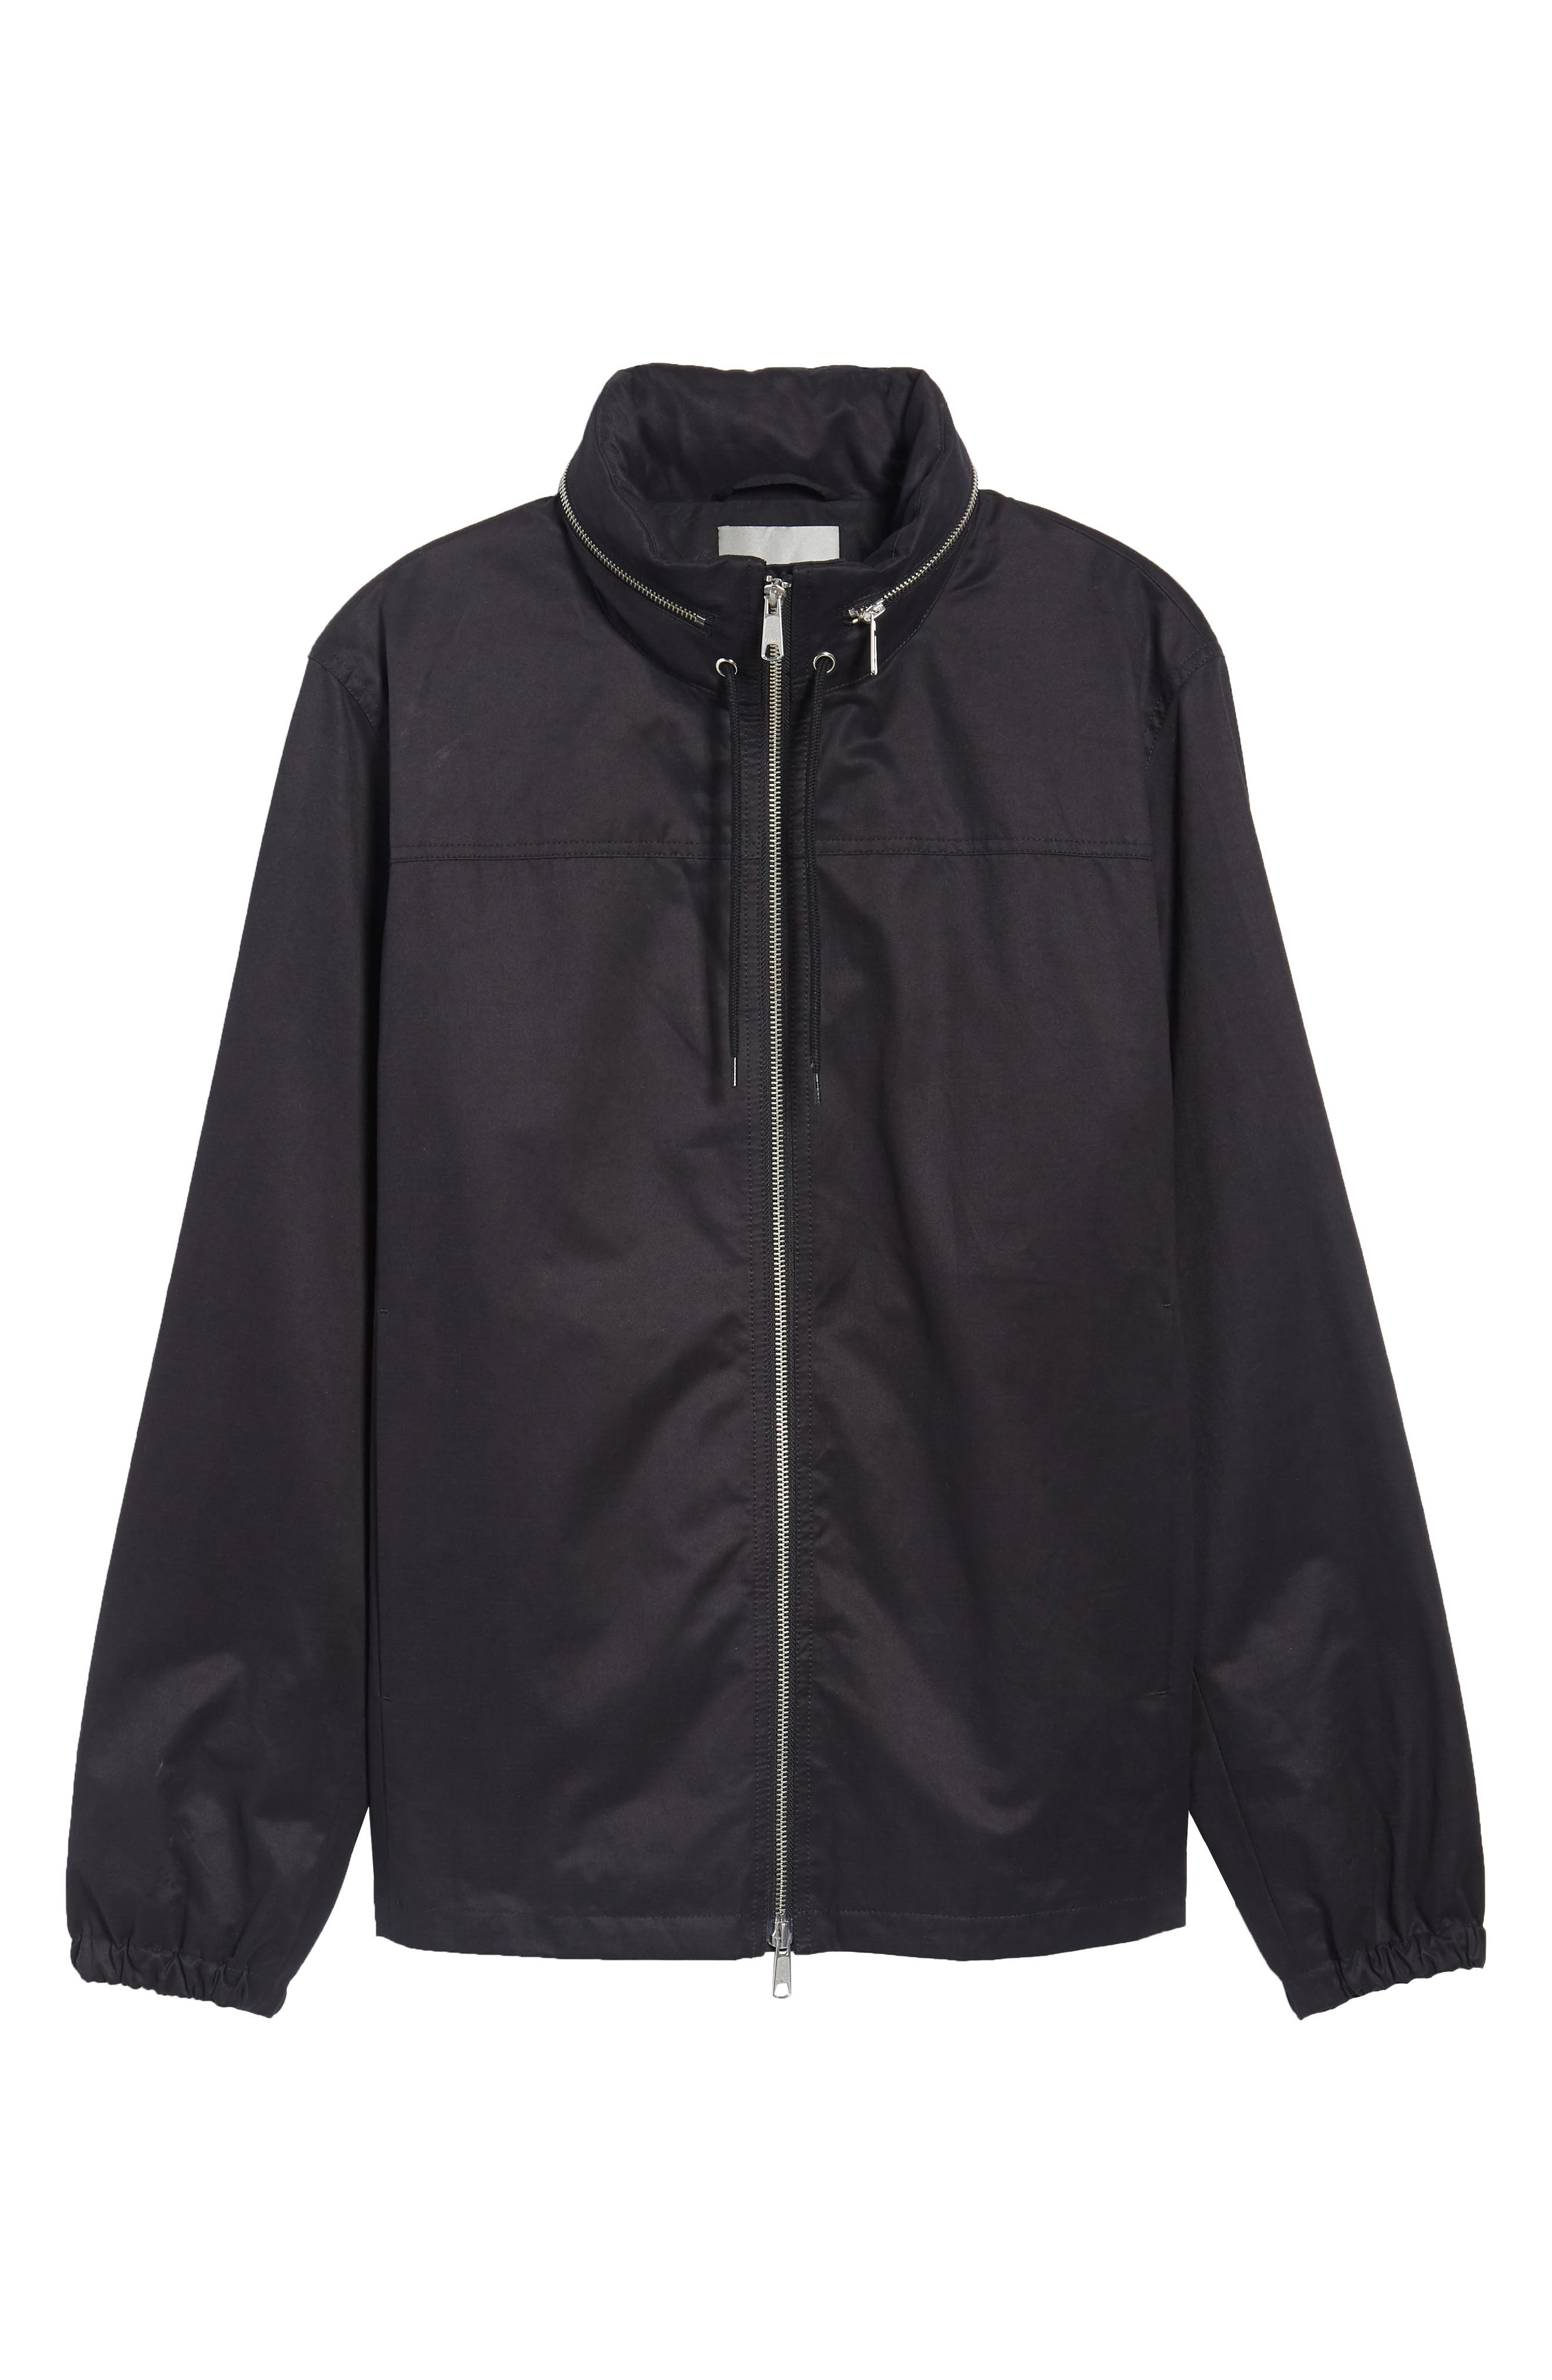 Regular Fit Hooded Jacket,                             Alternate thumbnail 5, color,                             001